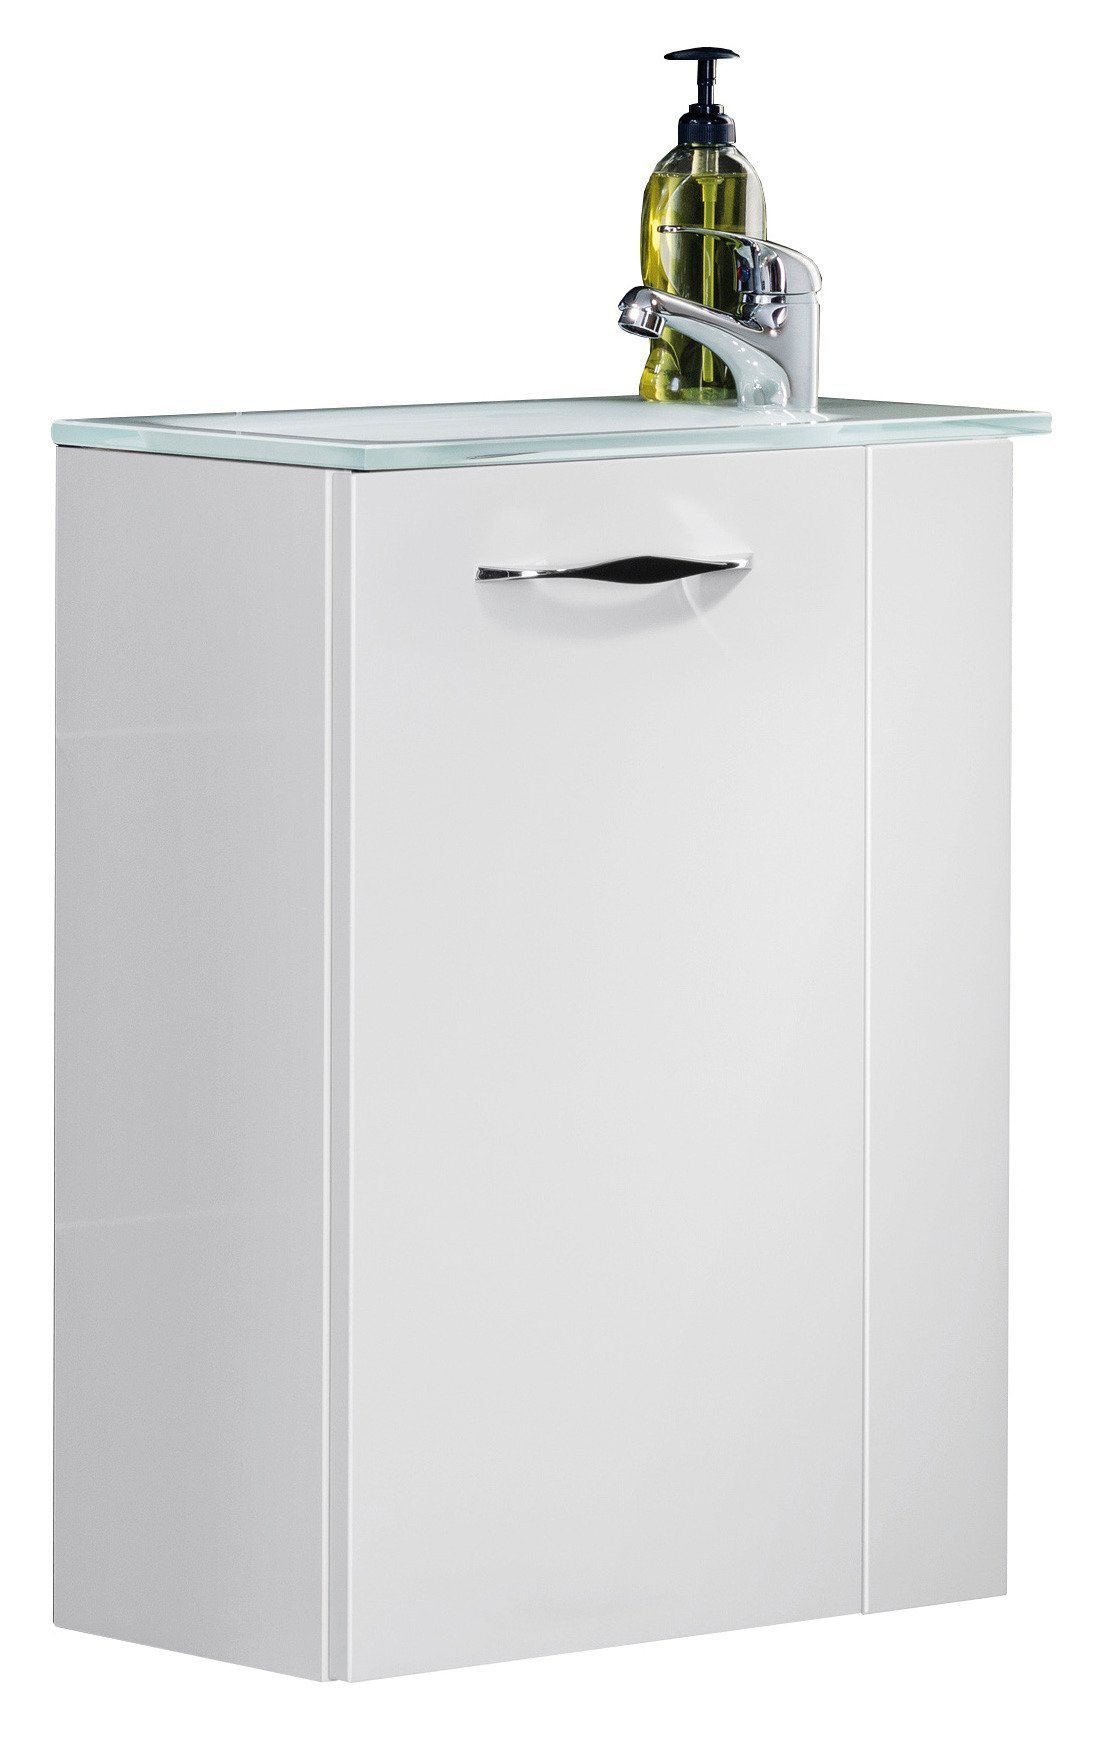 Mini-Gäste-WC-Lösung »SCENO«, Breite 45 cm, Tiefe 25 cm (2-tlg.)